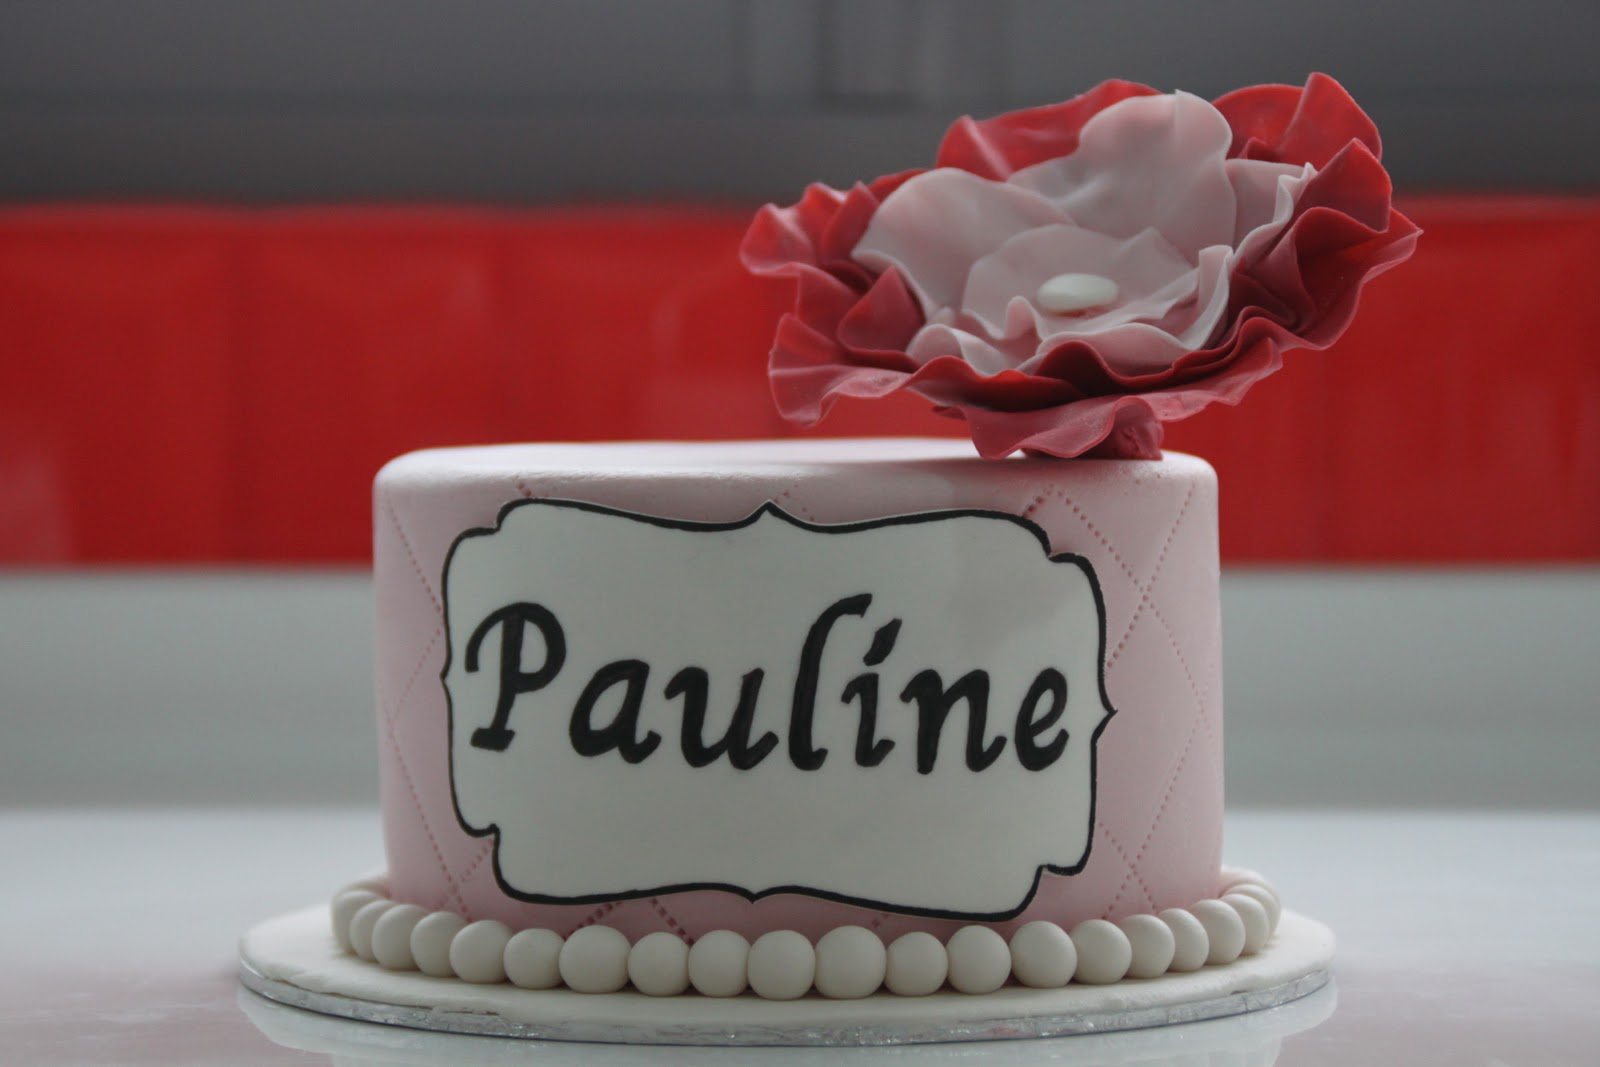 Celebrate With Cake! Elegant Flower Theme Cake